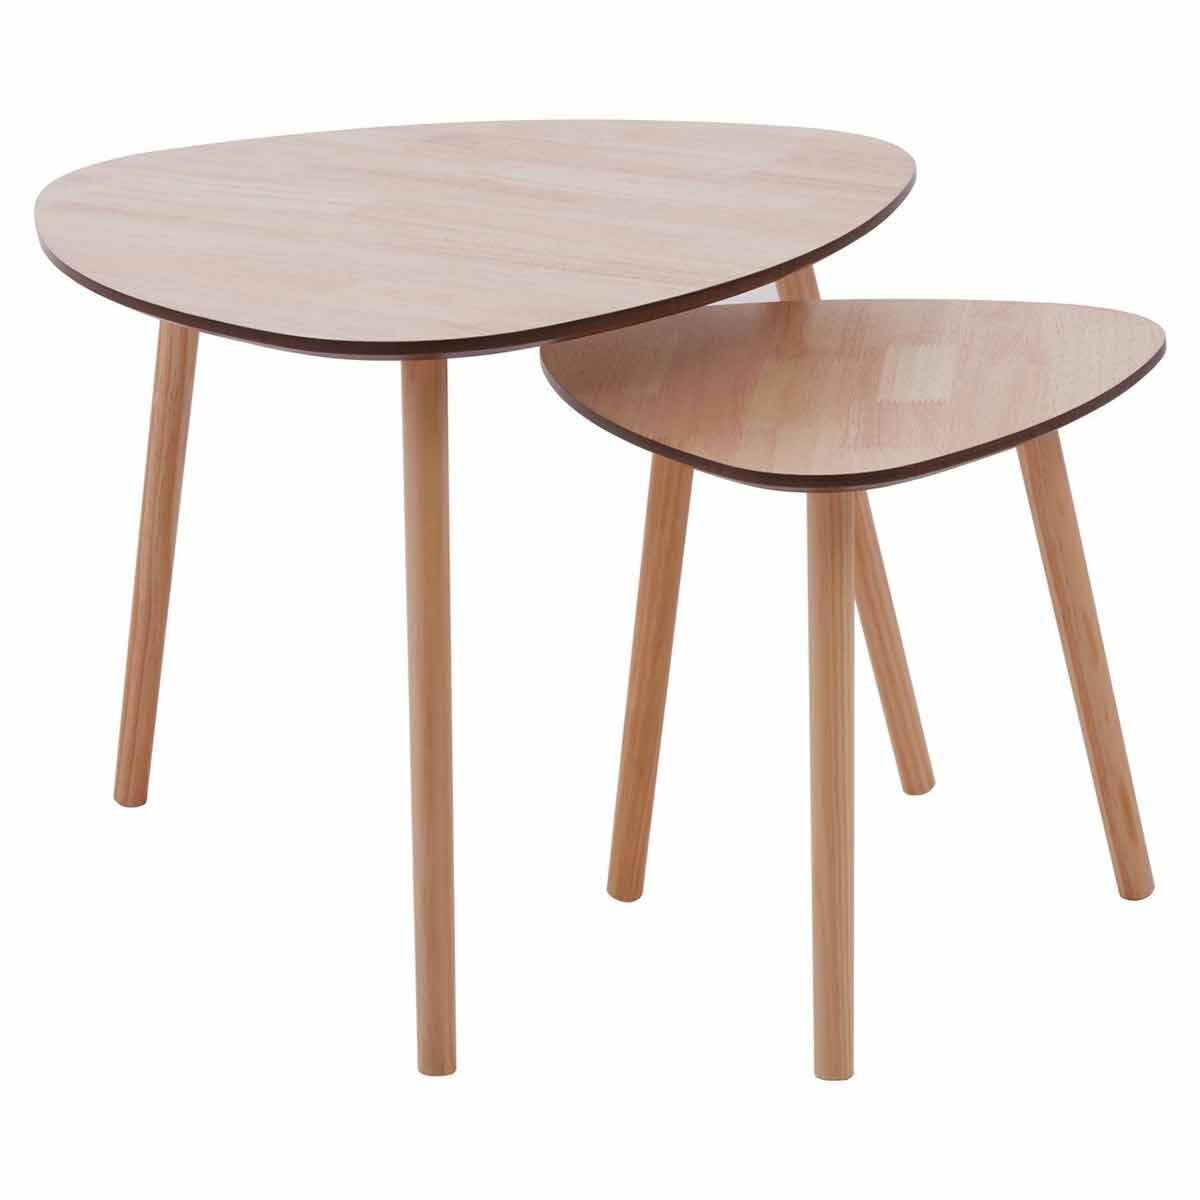 Premier Housewares Triangular Side Tables Set of 2